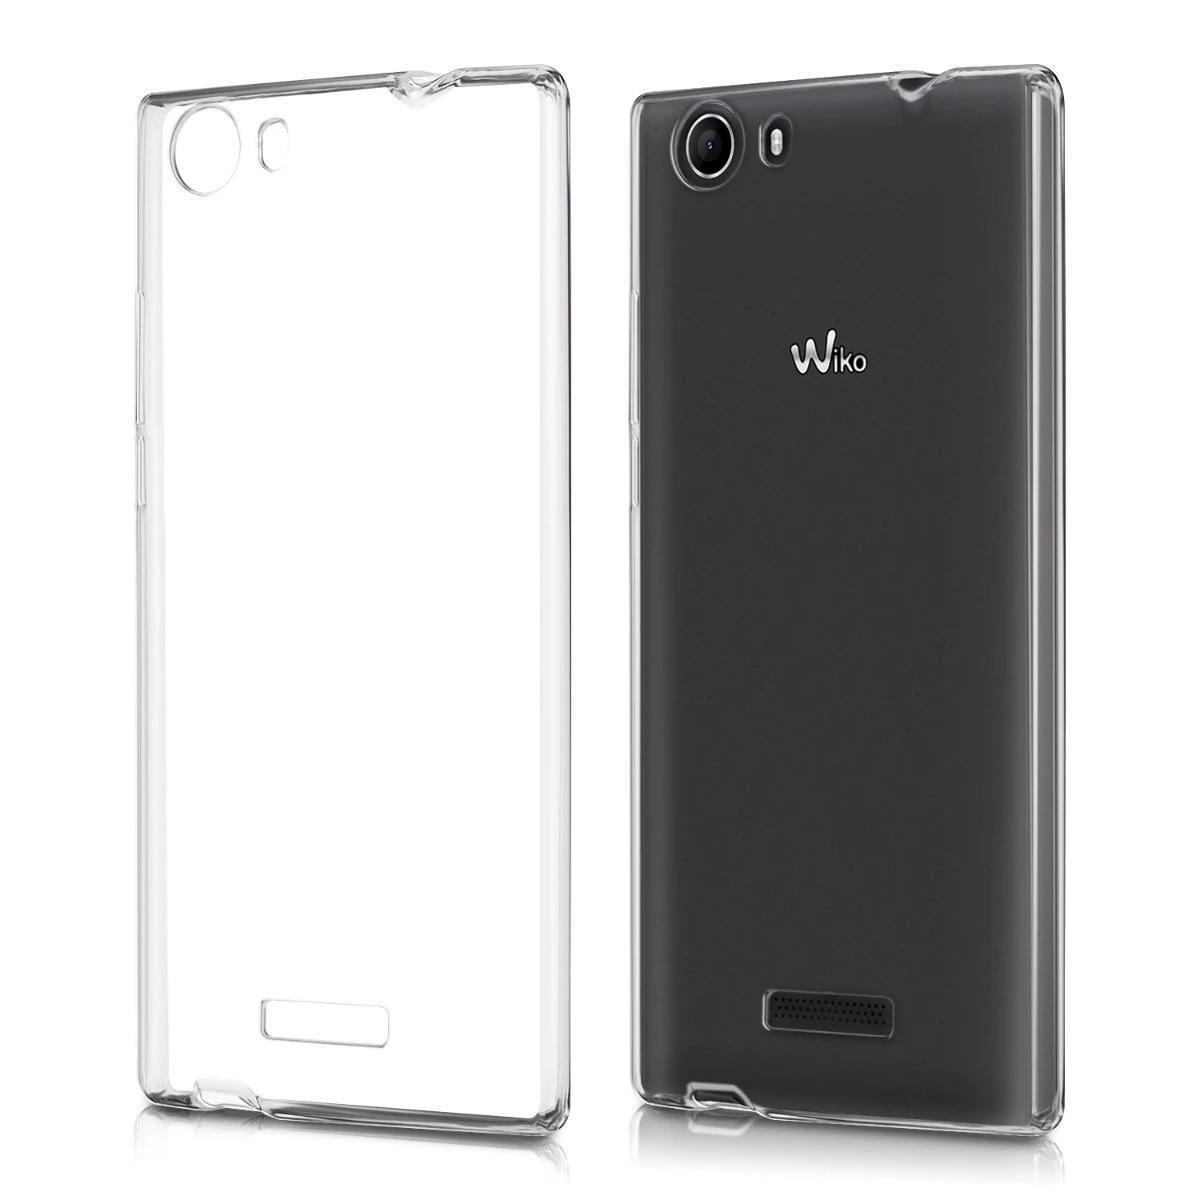 US $2.95 |Transparent Case For Wiko Ridge Fab 4G (5.5